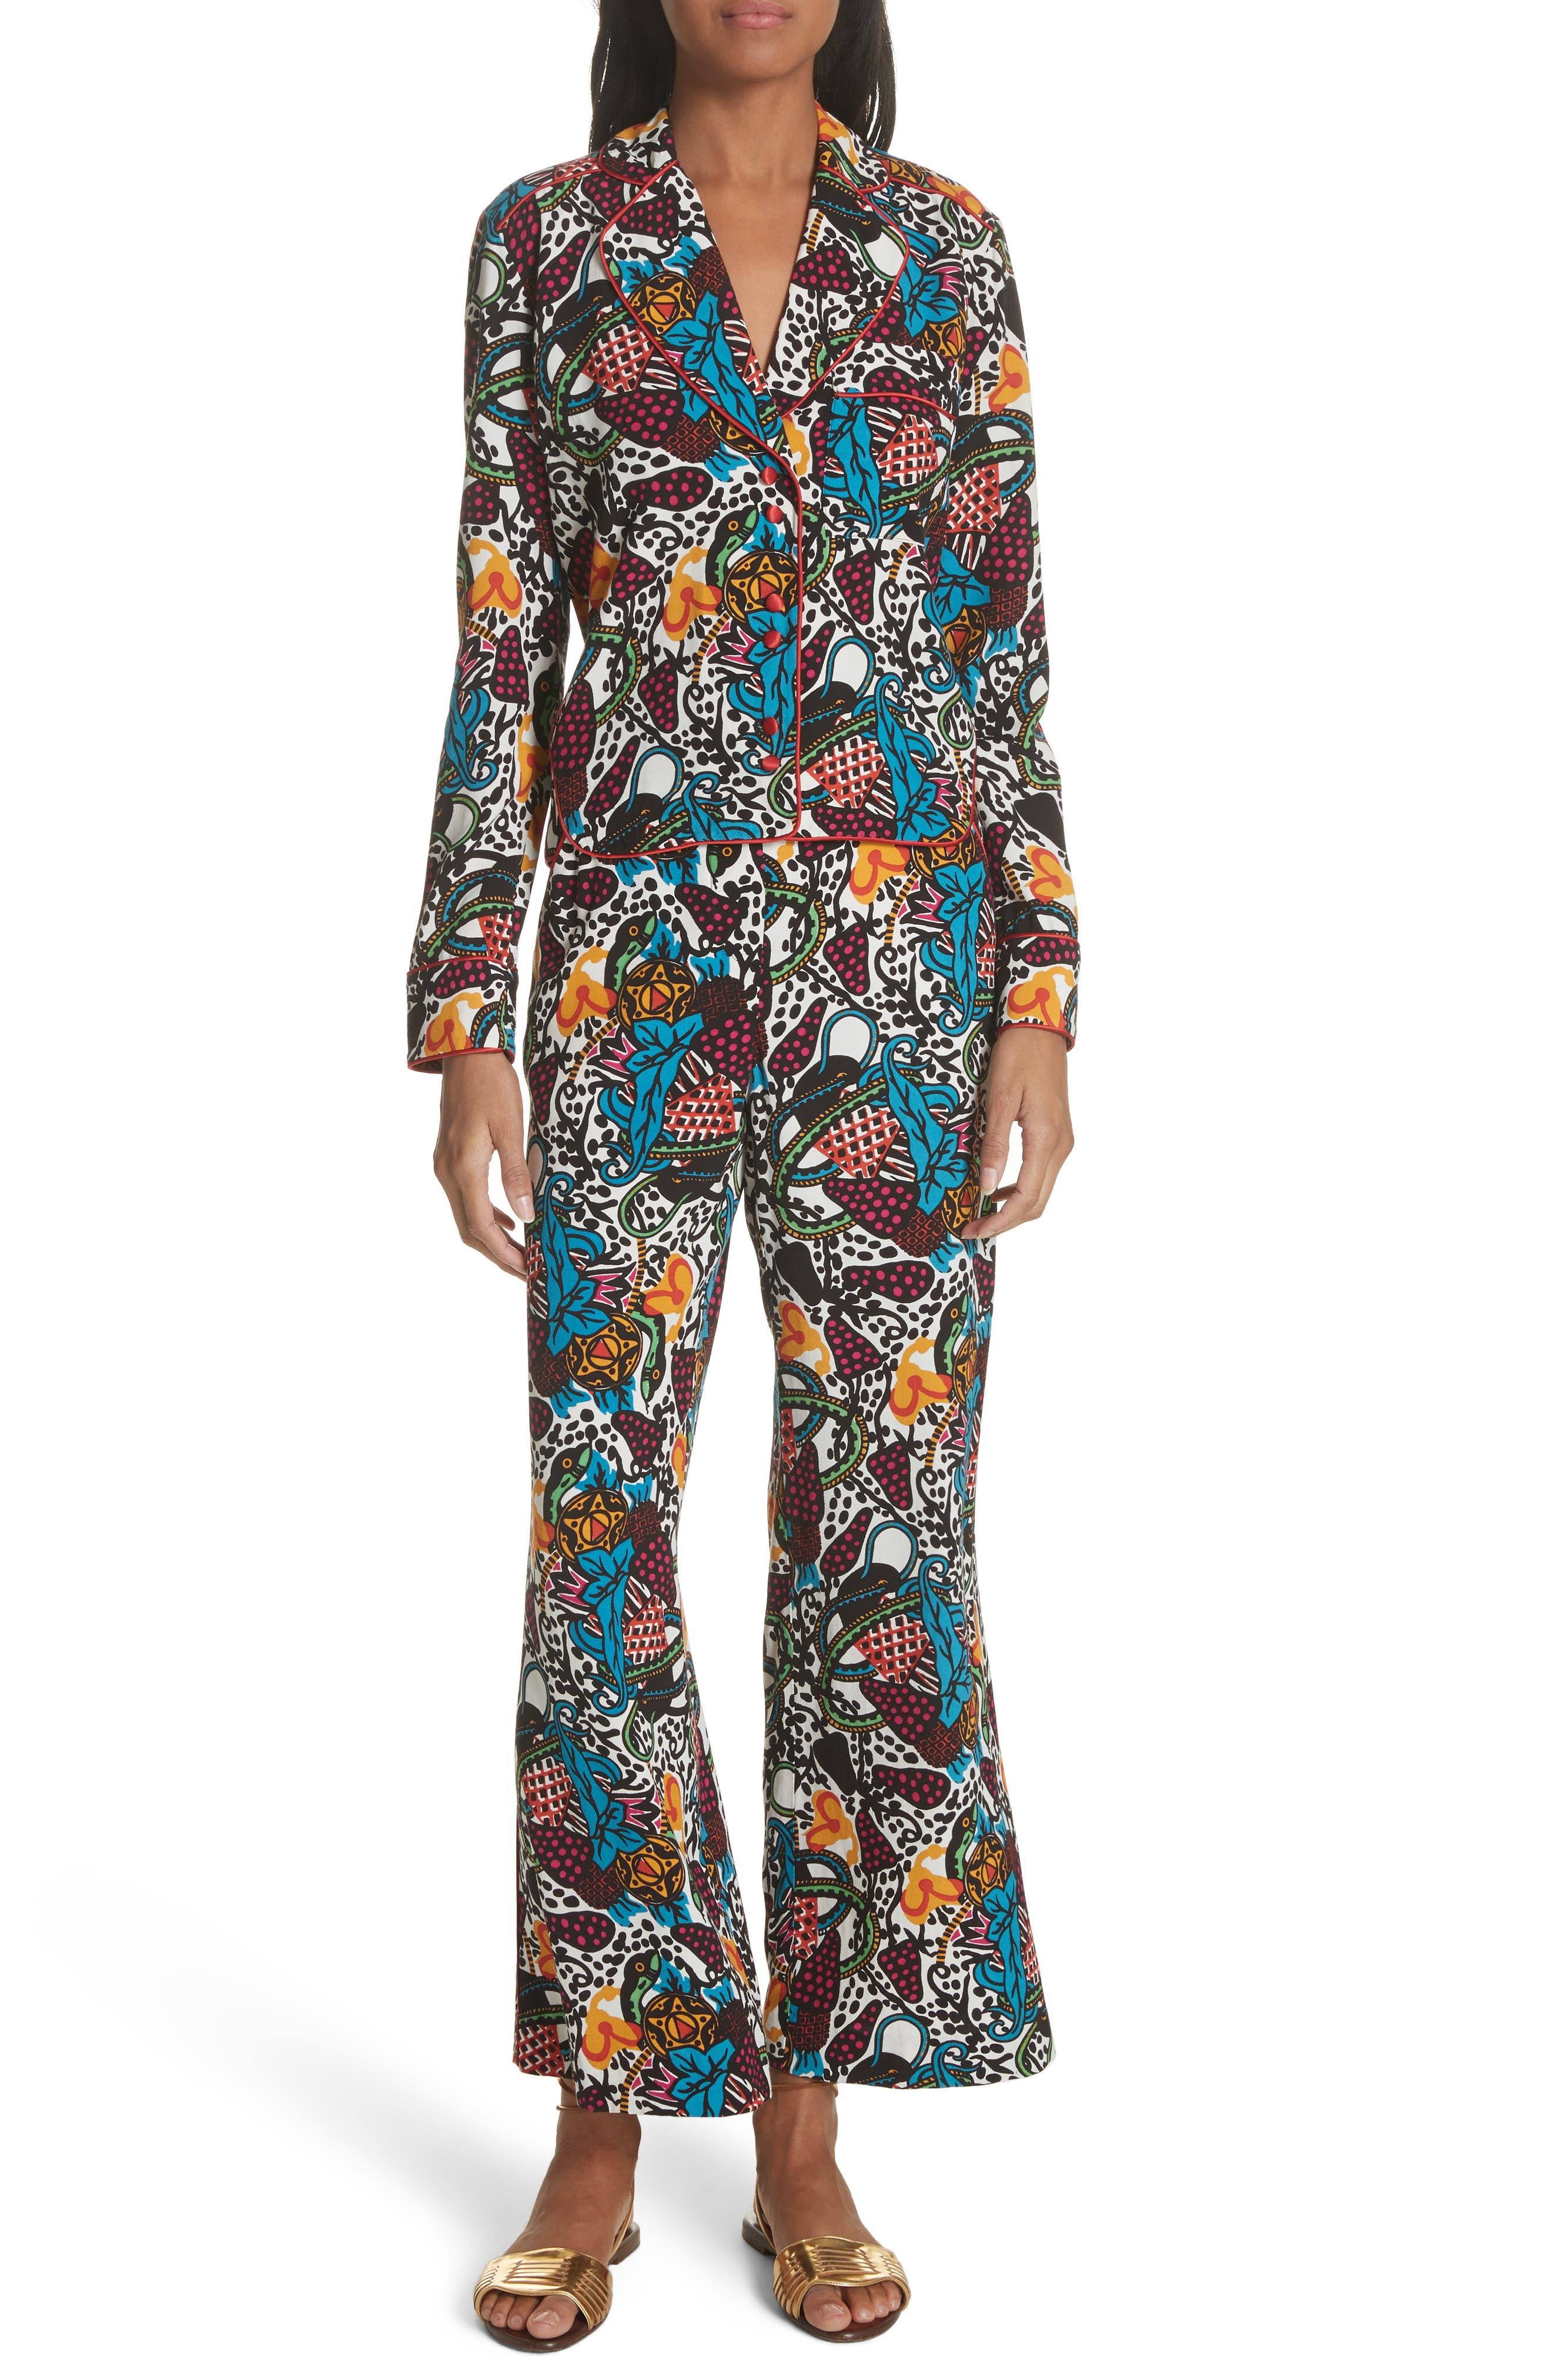 Penelope Pajama Shirt,                             Alternate thumbnail 7, color,                             Off White/ Blue/ Green/ Yellow